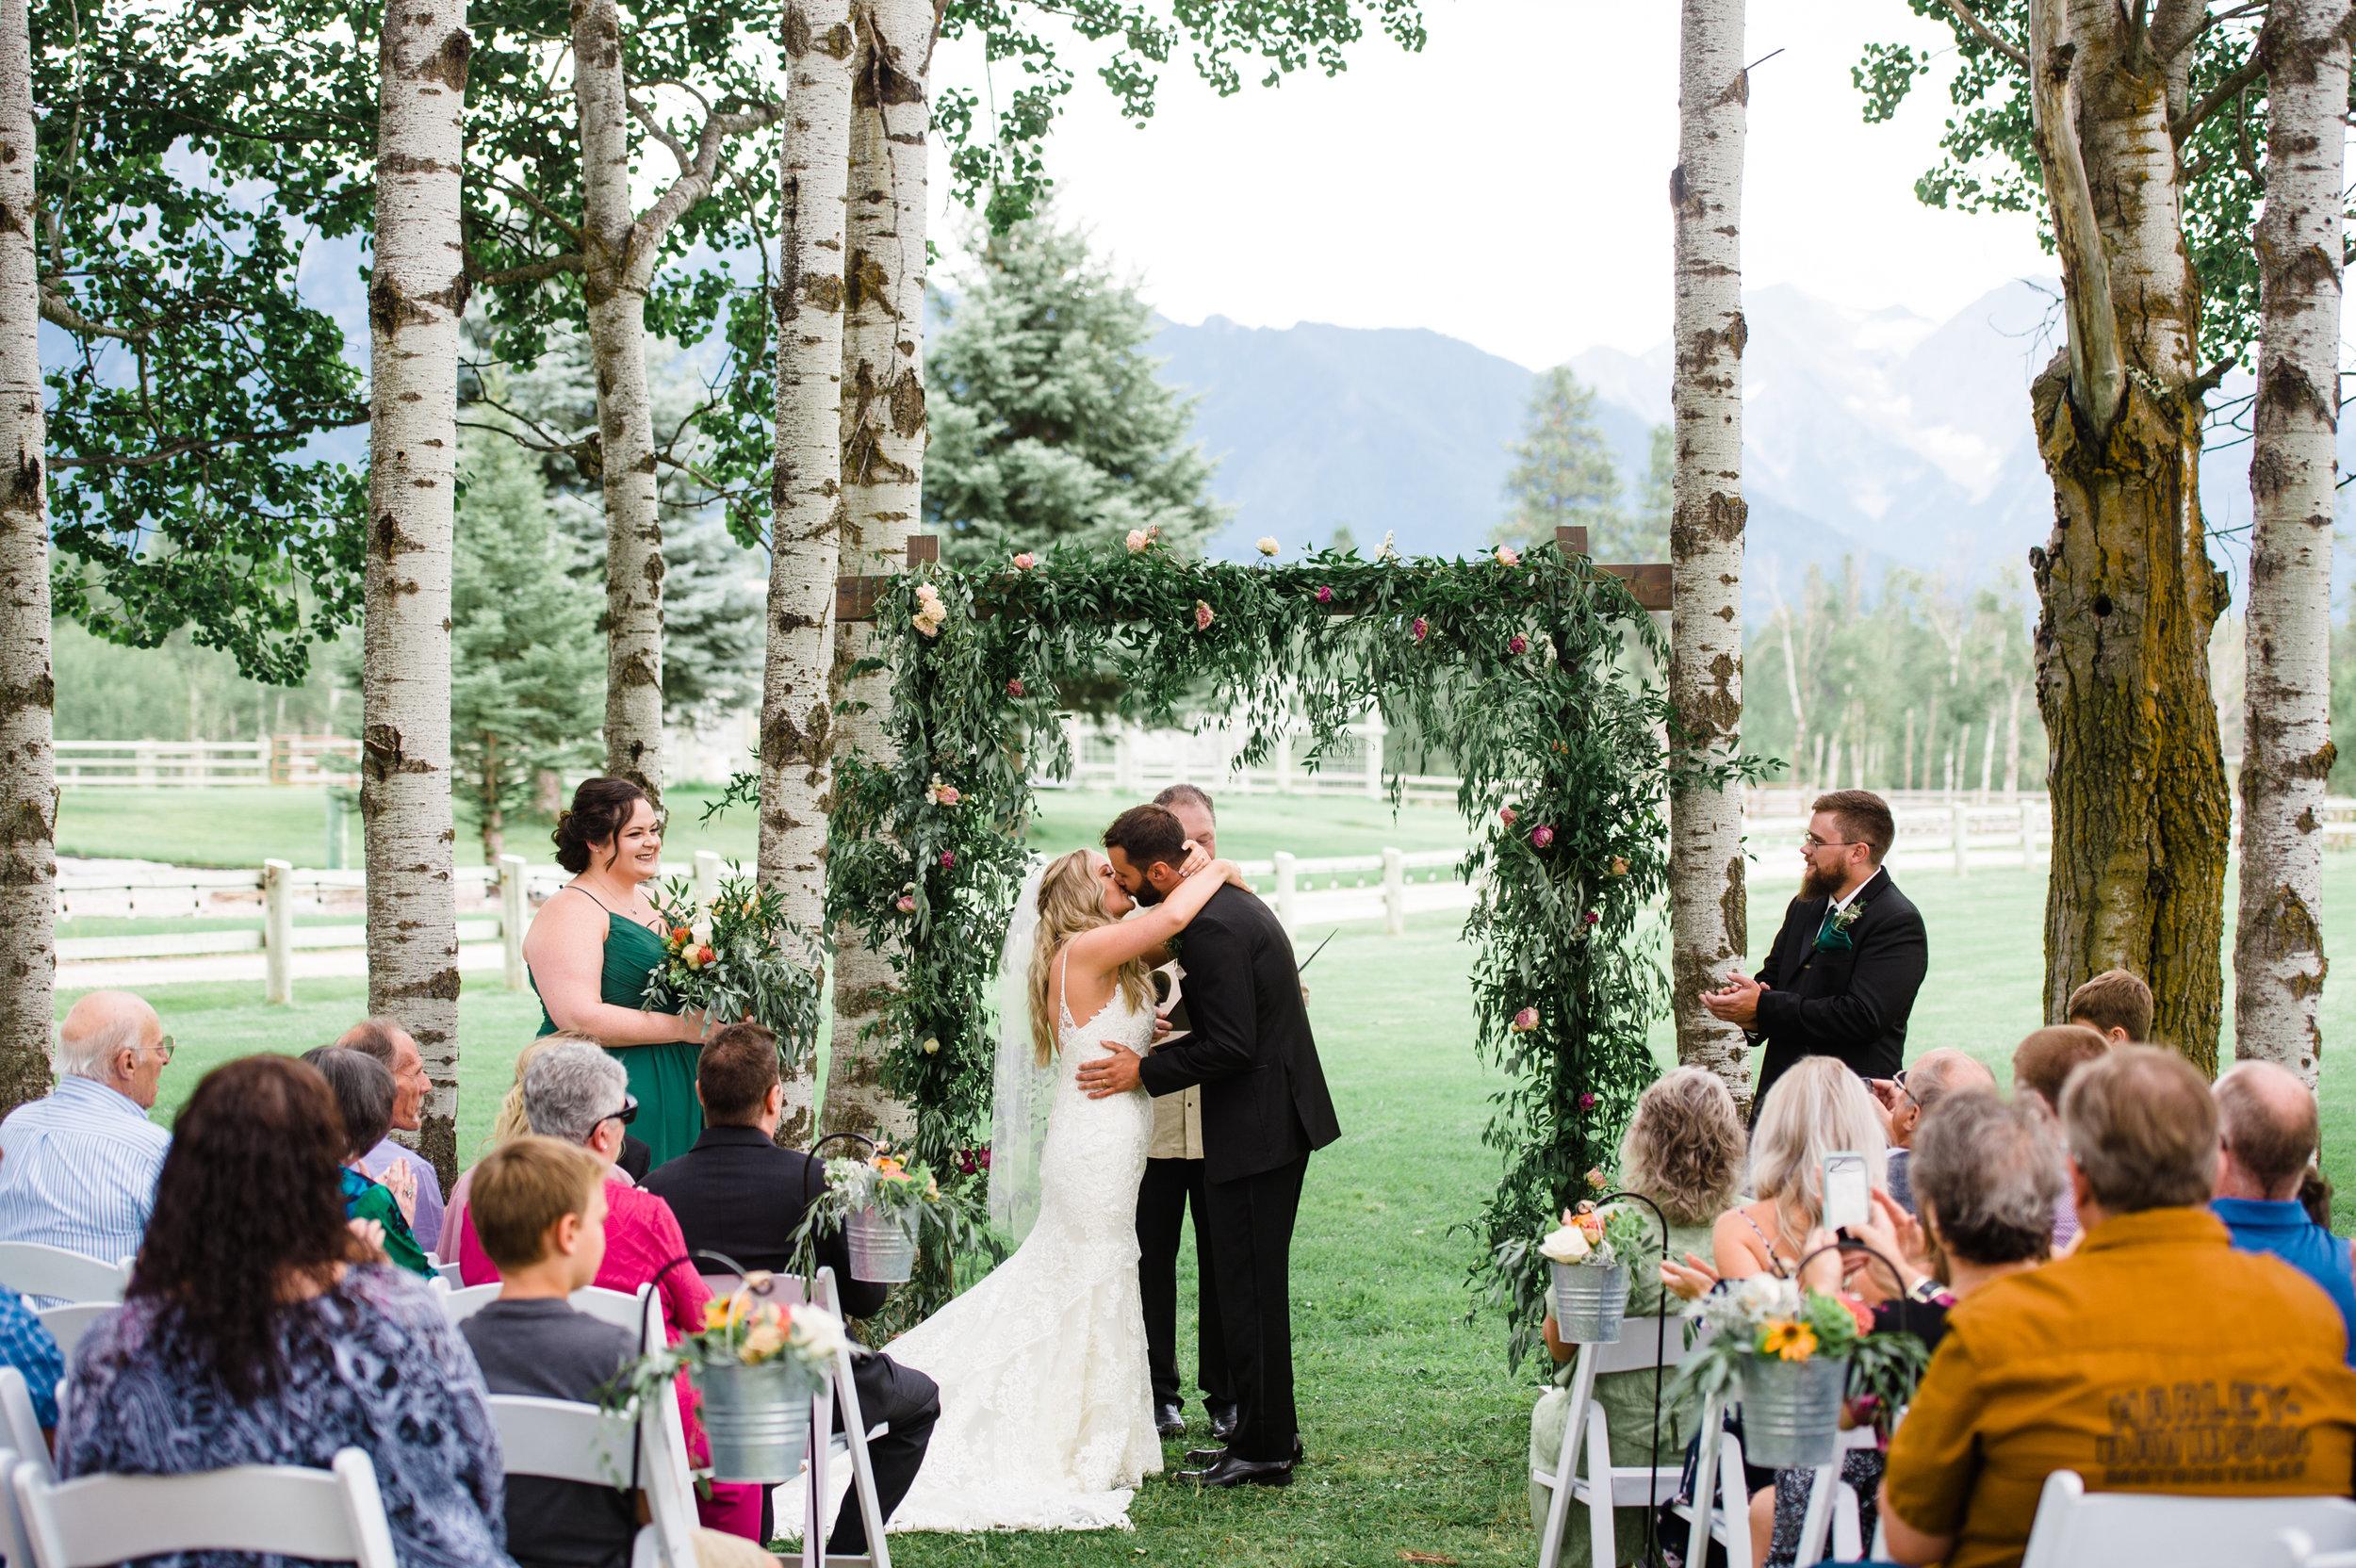 005Sky Ridge Ranch Wedding_Montana Wedding Photographer_Jessica & Brian_Honeybee Weddings_August 24, 2019-4.jpg